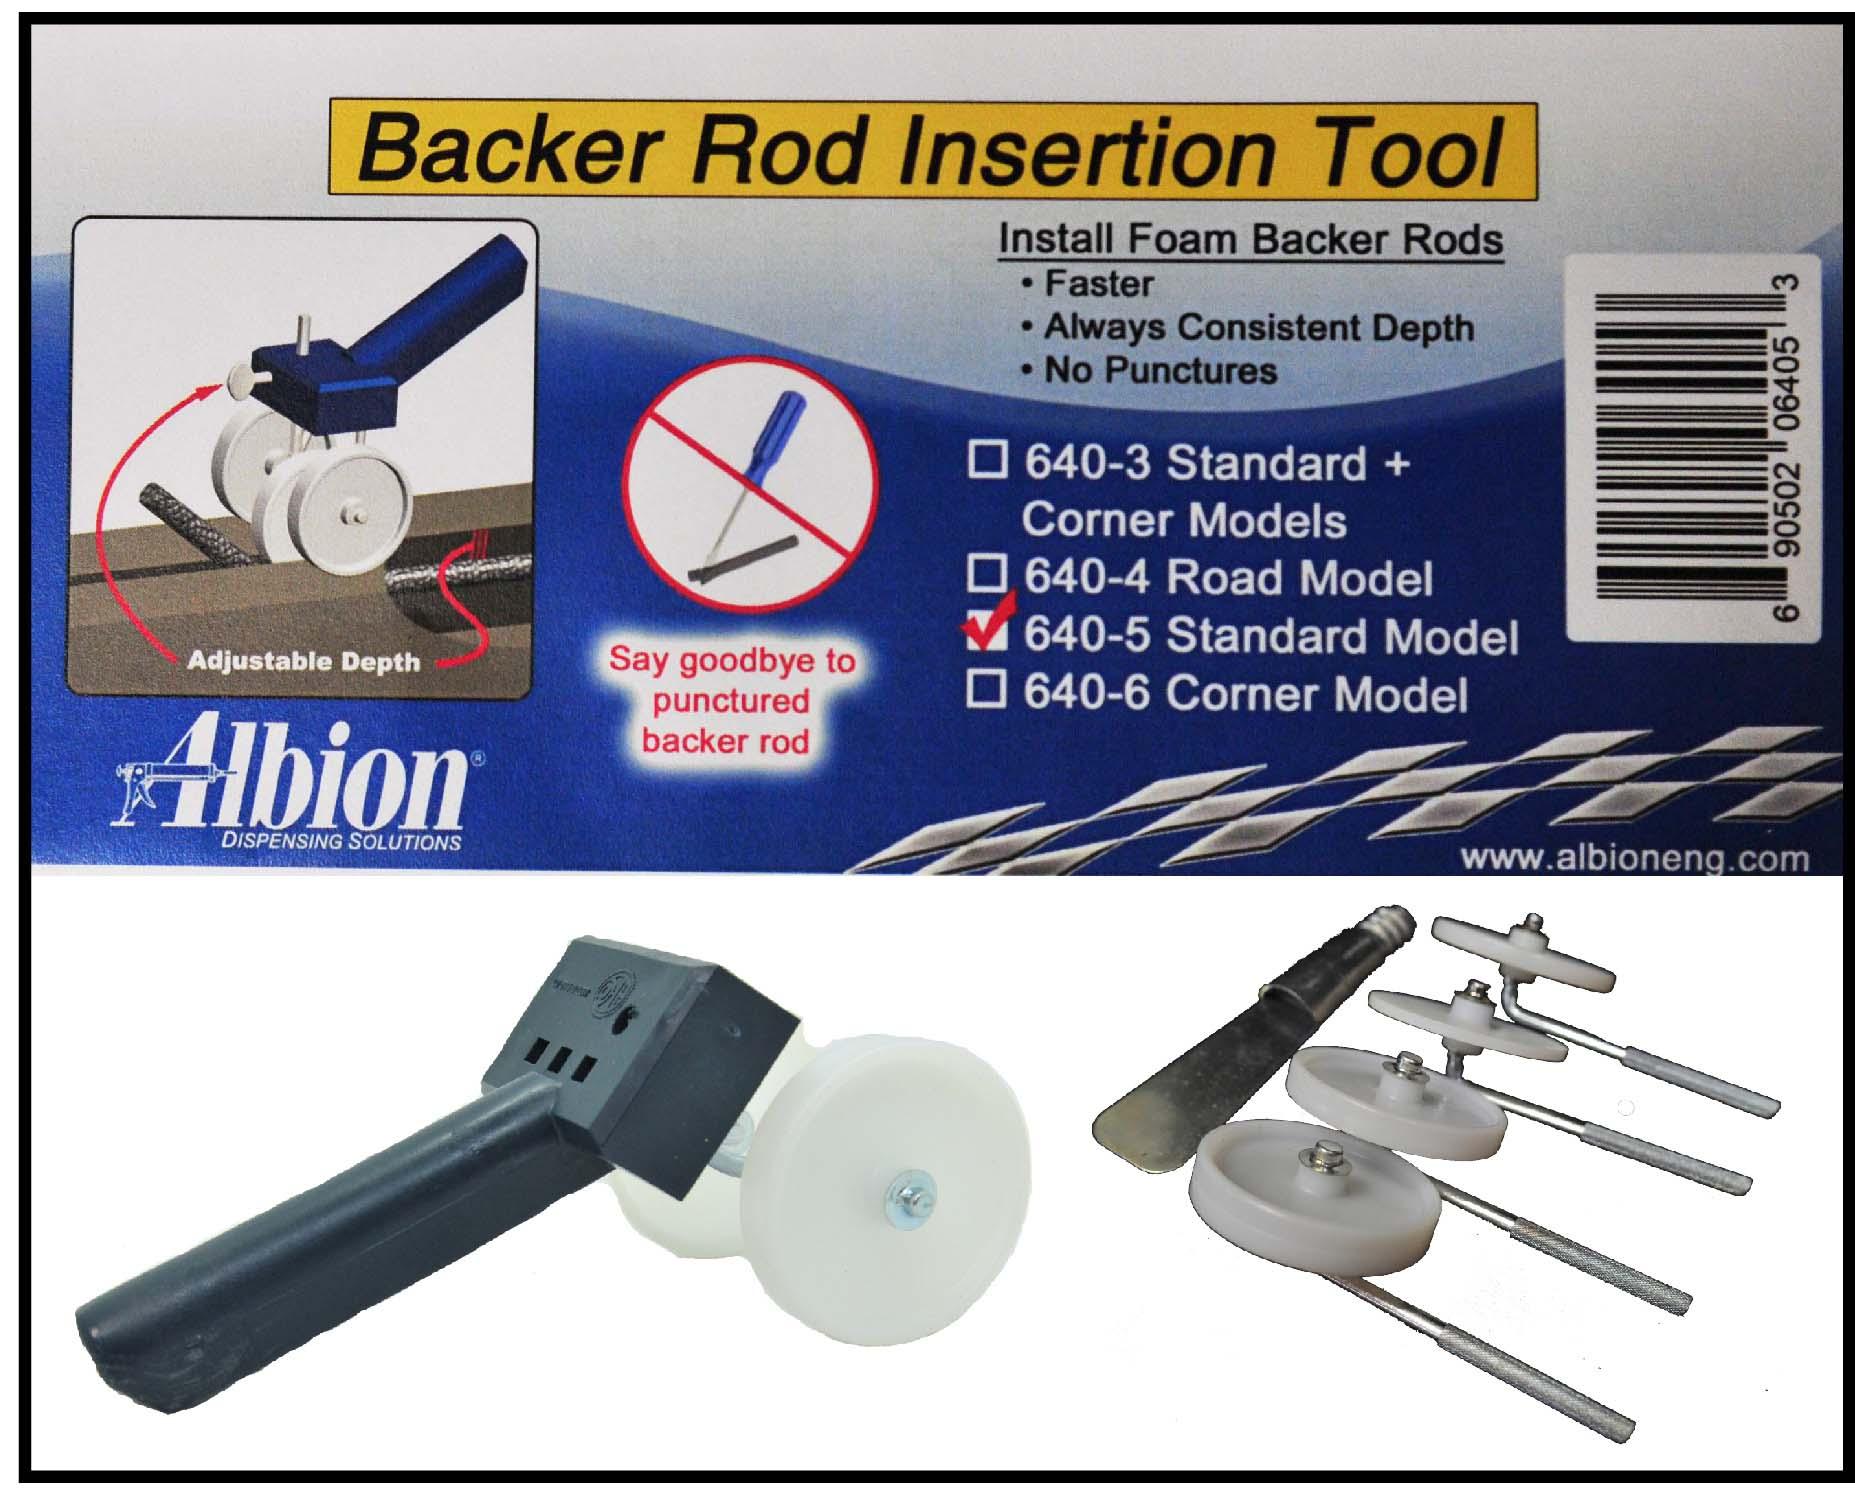 Albion Backer Rod Insertion Tool